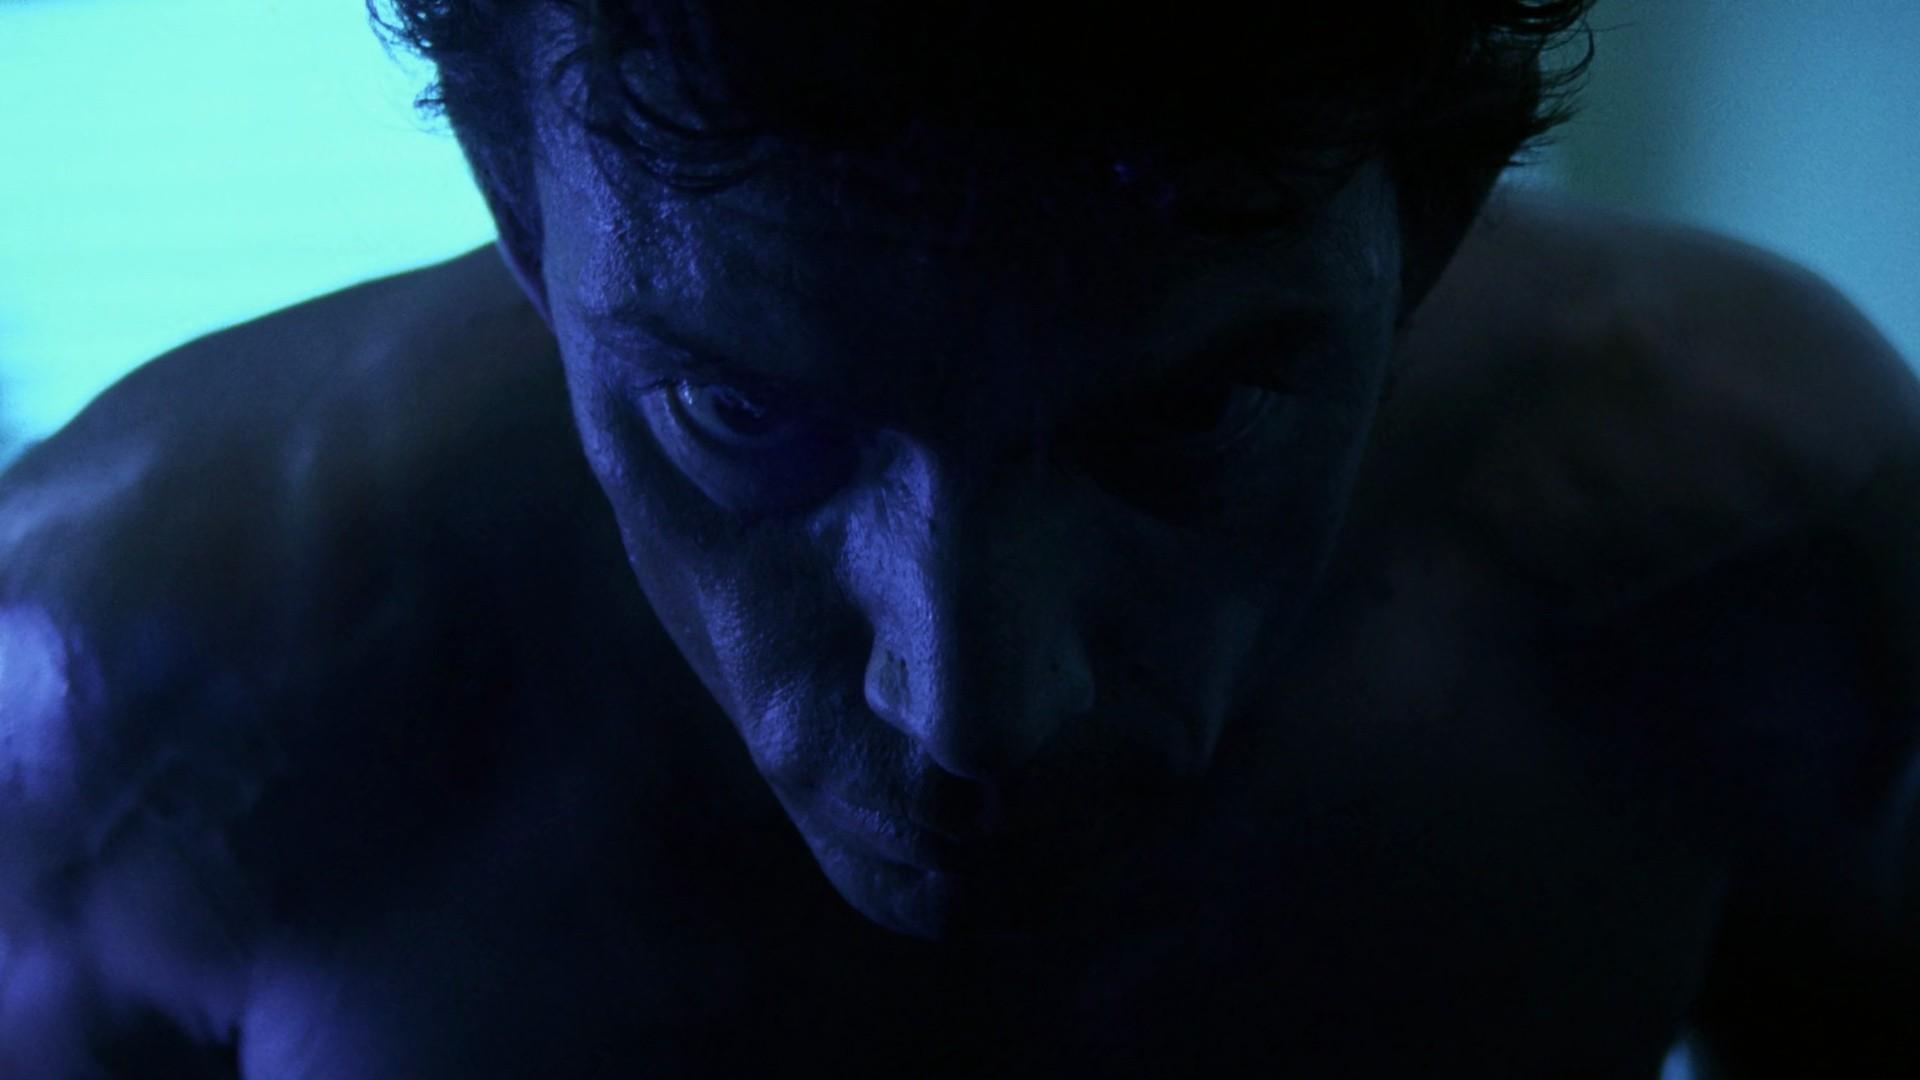 https://shotcan.com/images/body_melt_1.jpg